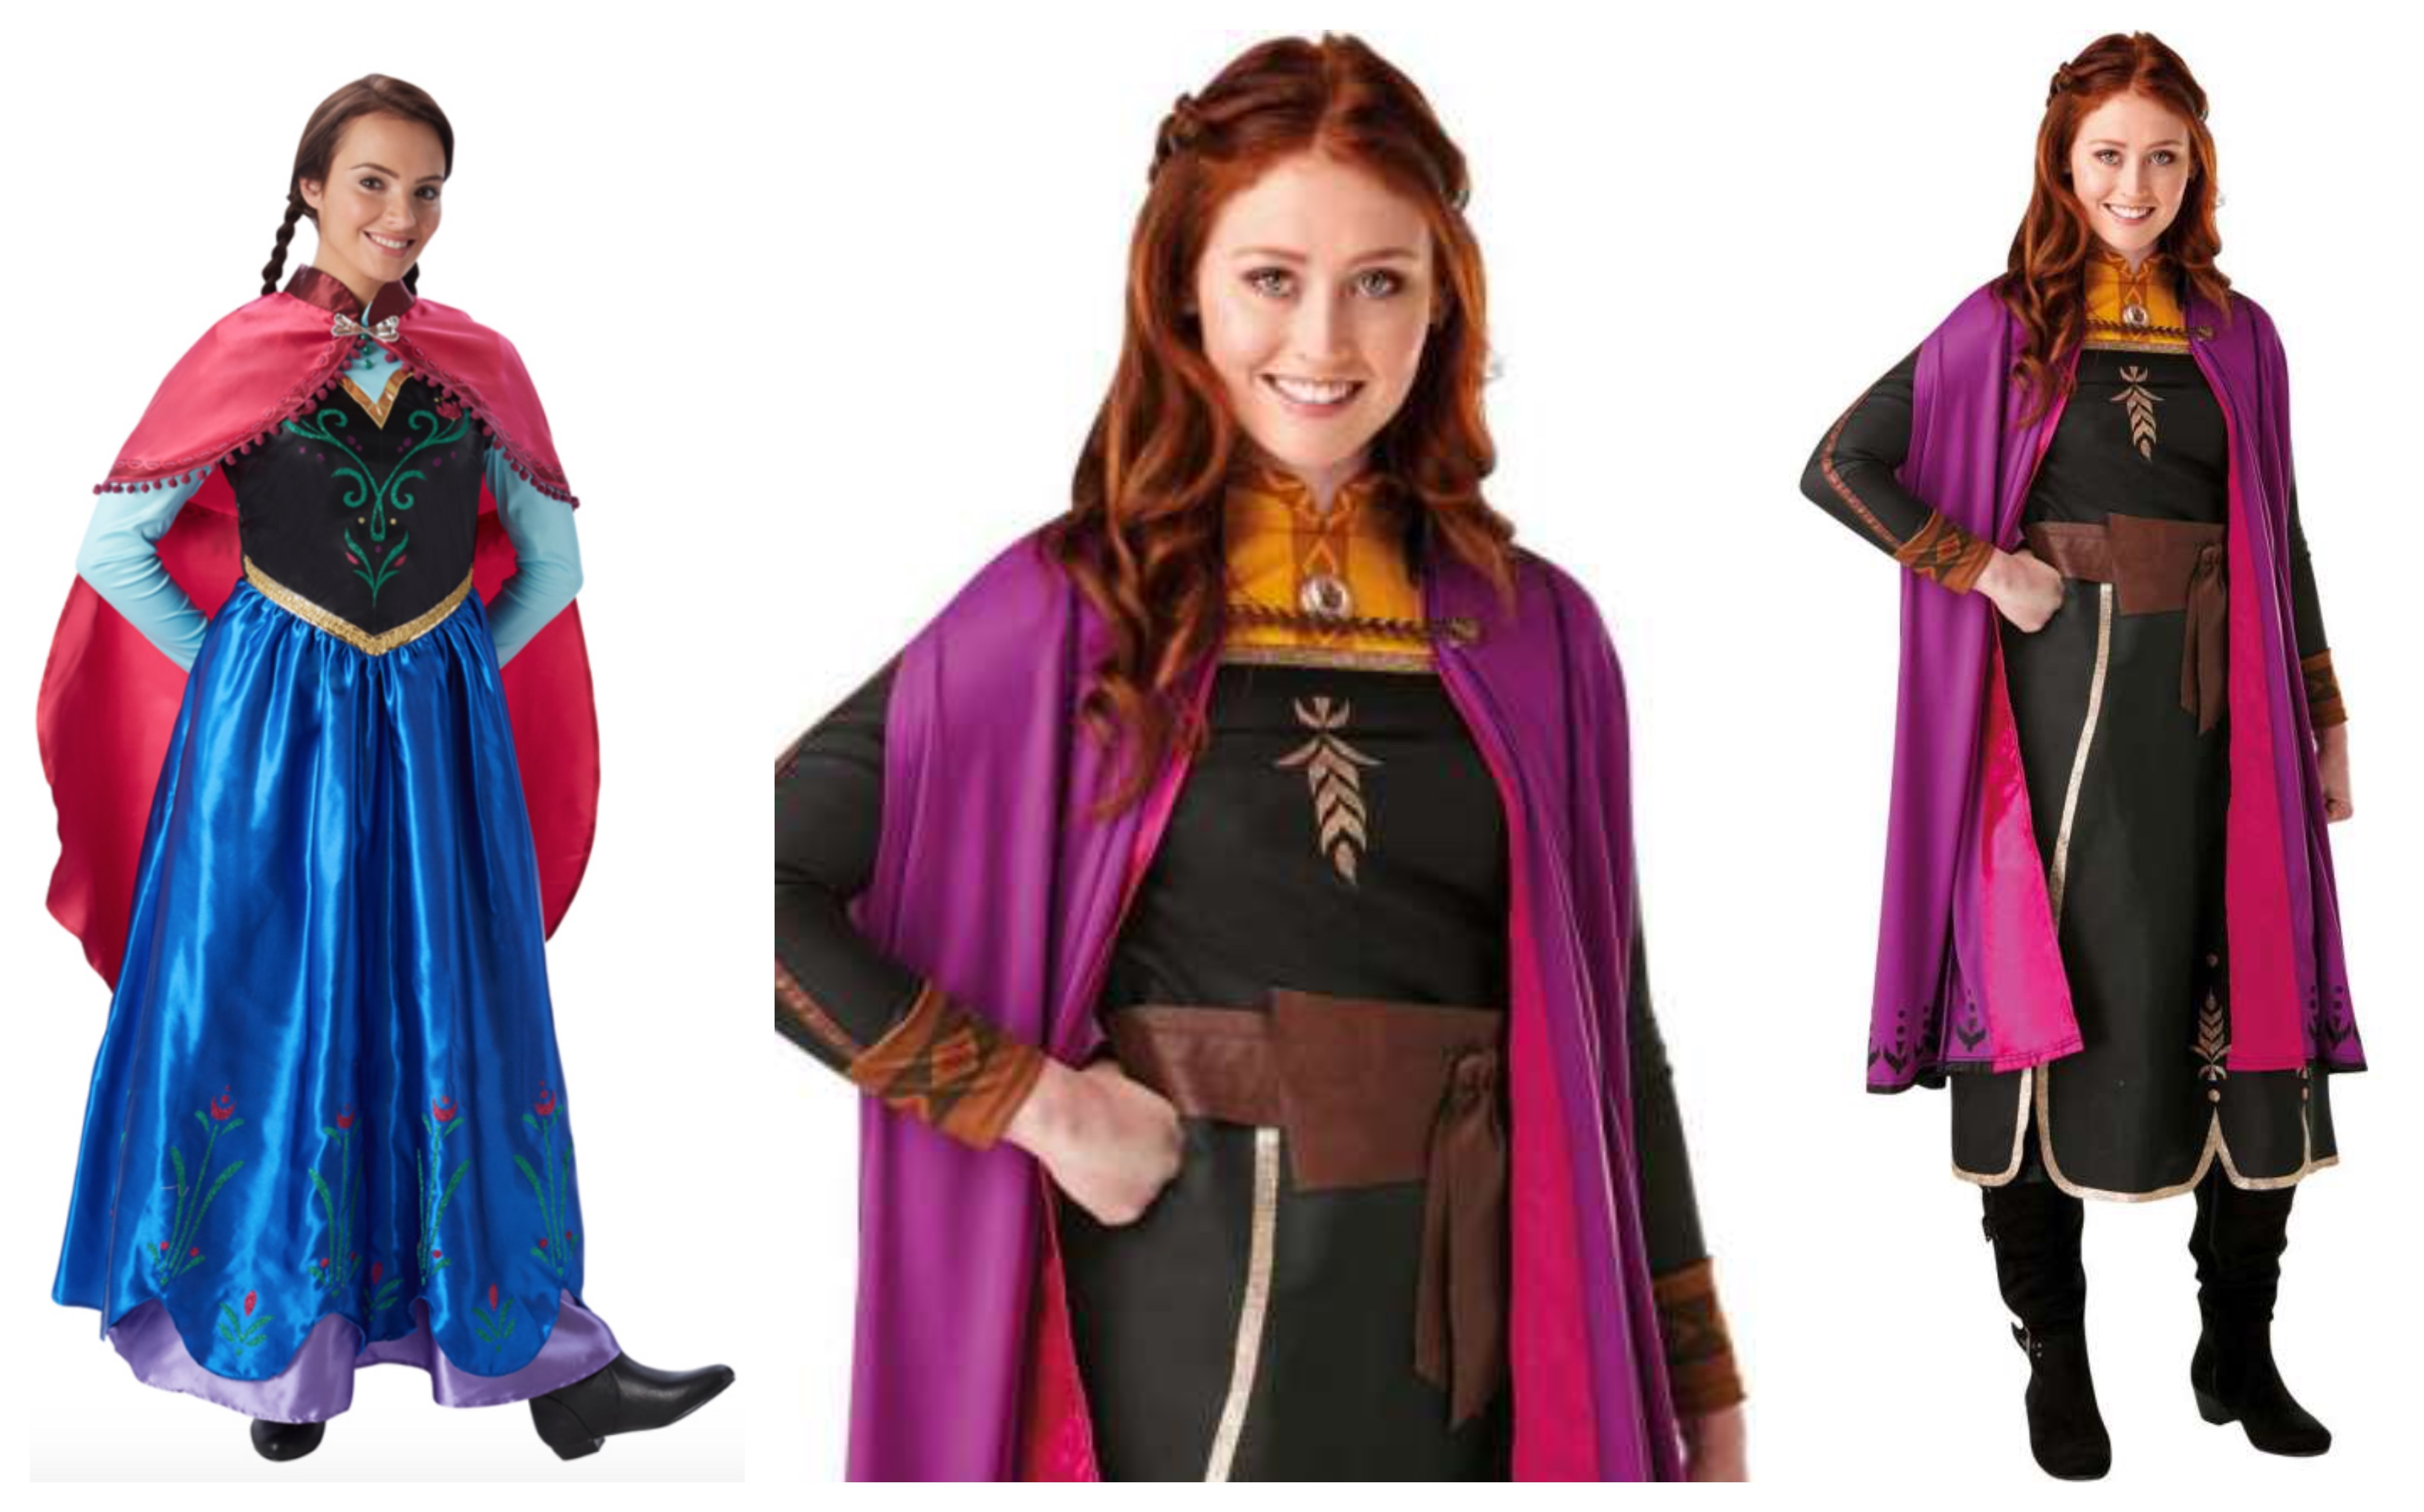 Anna disney prinsesse kostume til voksne - Disney prinsesse kostume til voksne